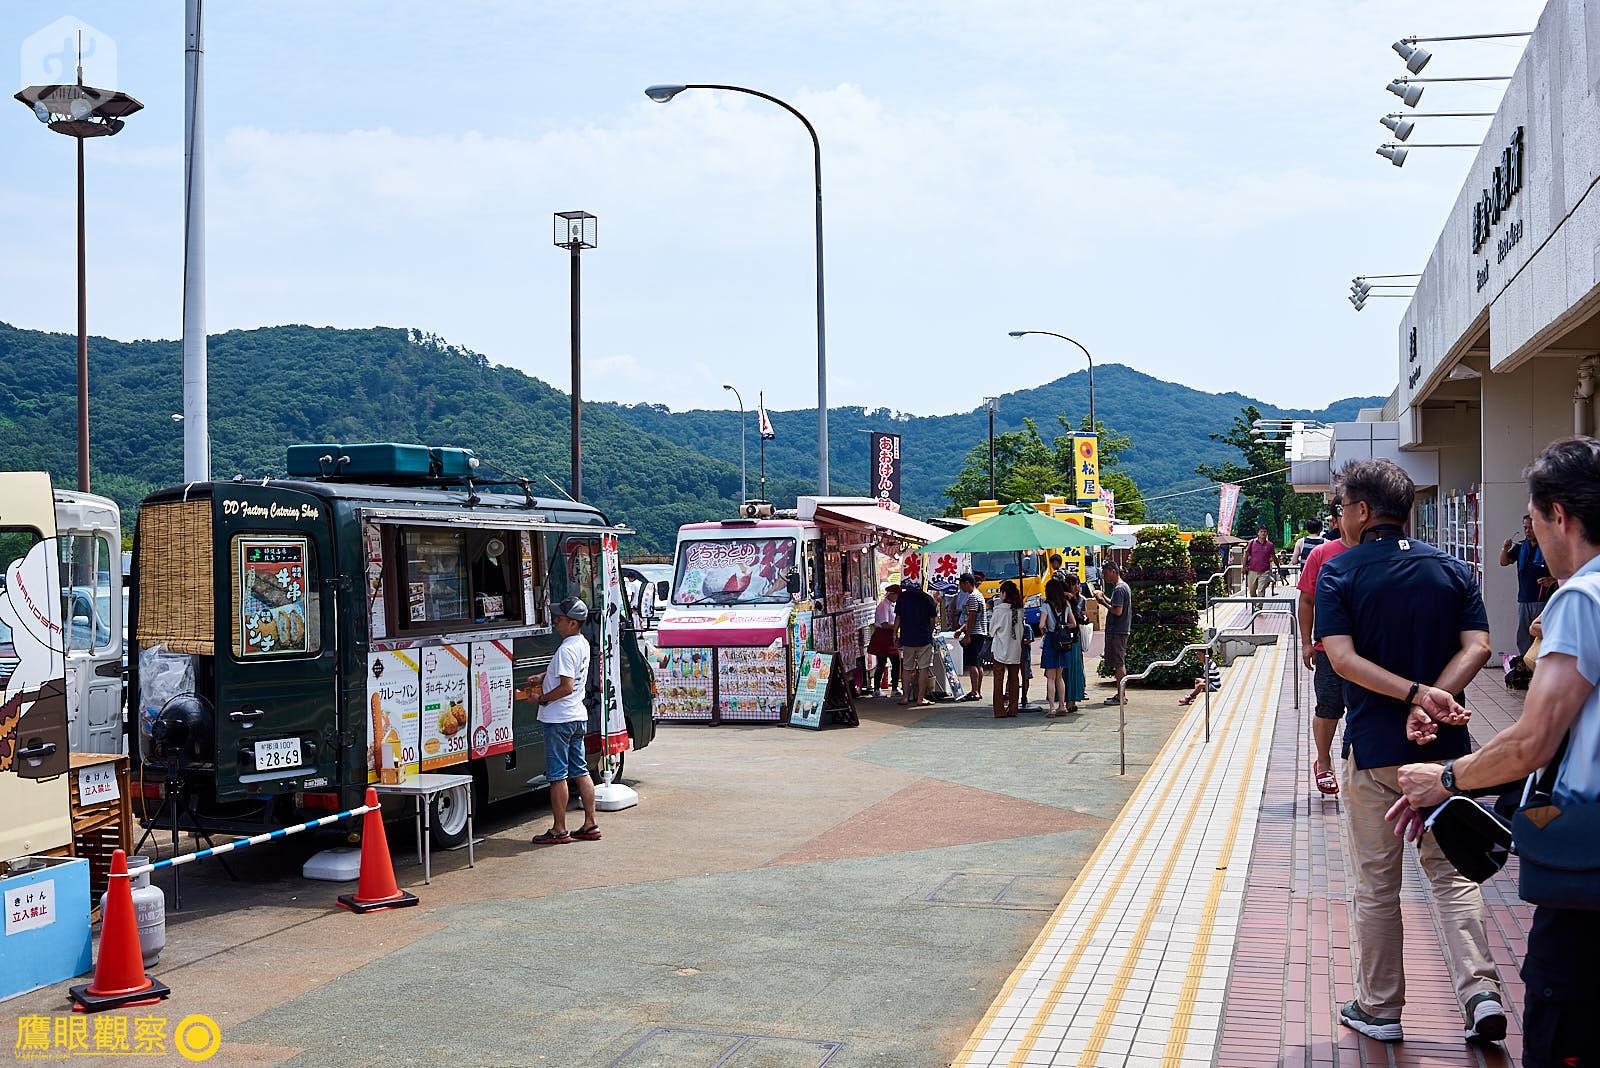 Japan Travel Highway rest stop 20190818110823 日本廢棄小學 🚗 RV 休旅車露營、森林探險之旅(櫪木縣鹿沼市立久我小學)🇯🇵⛺️